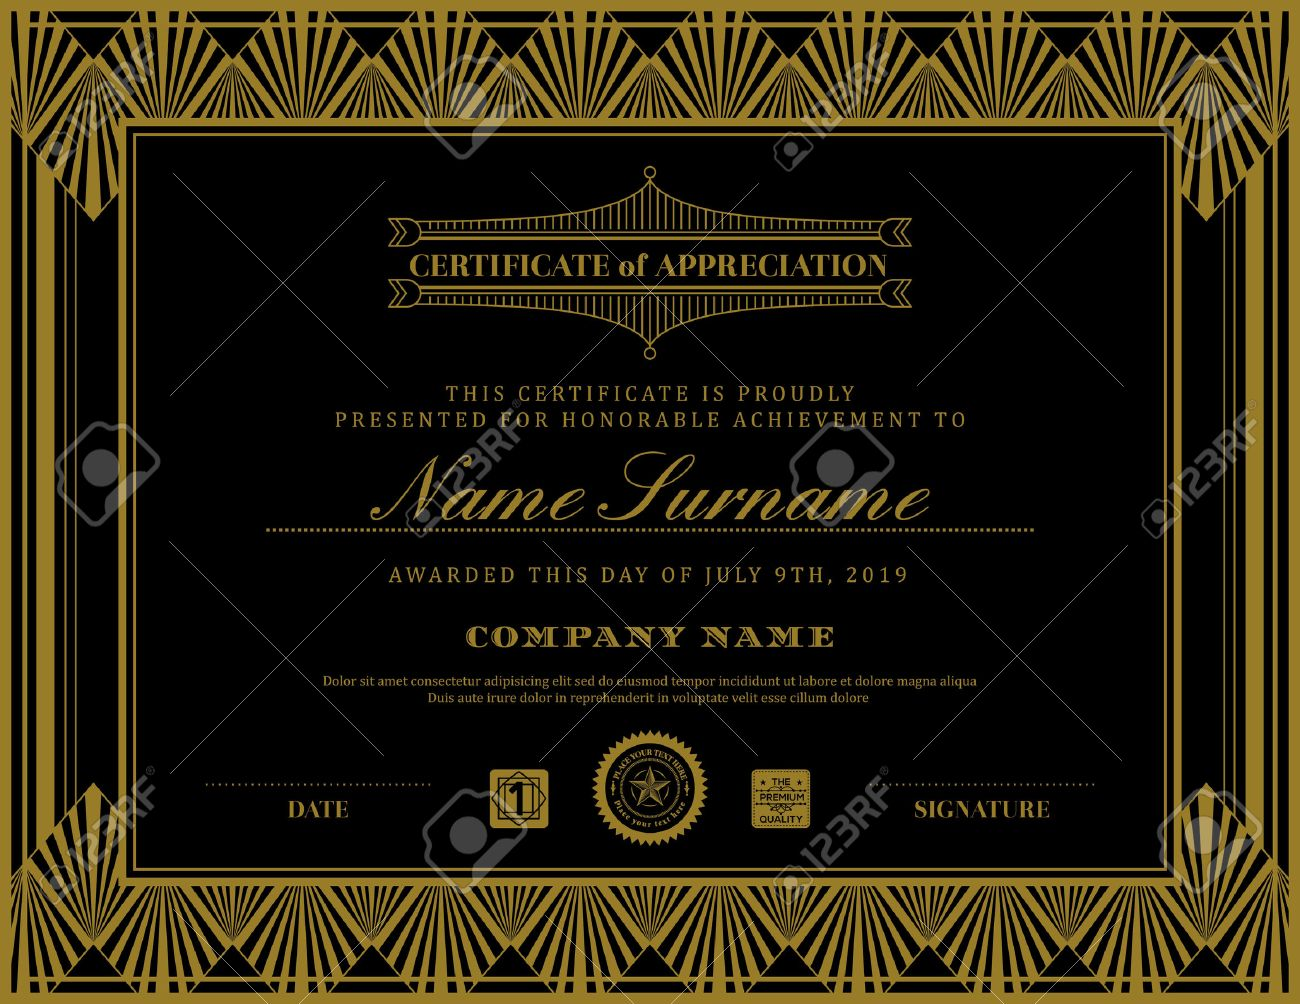 Vintage retro art deco frame certificate background design template - 50155141